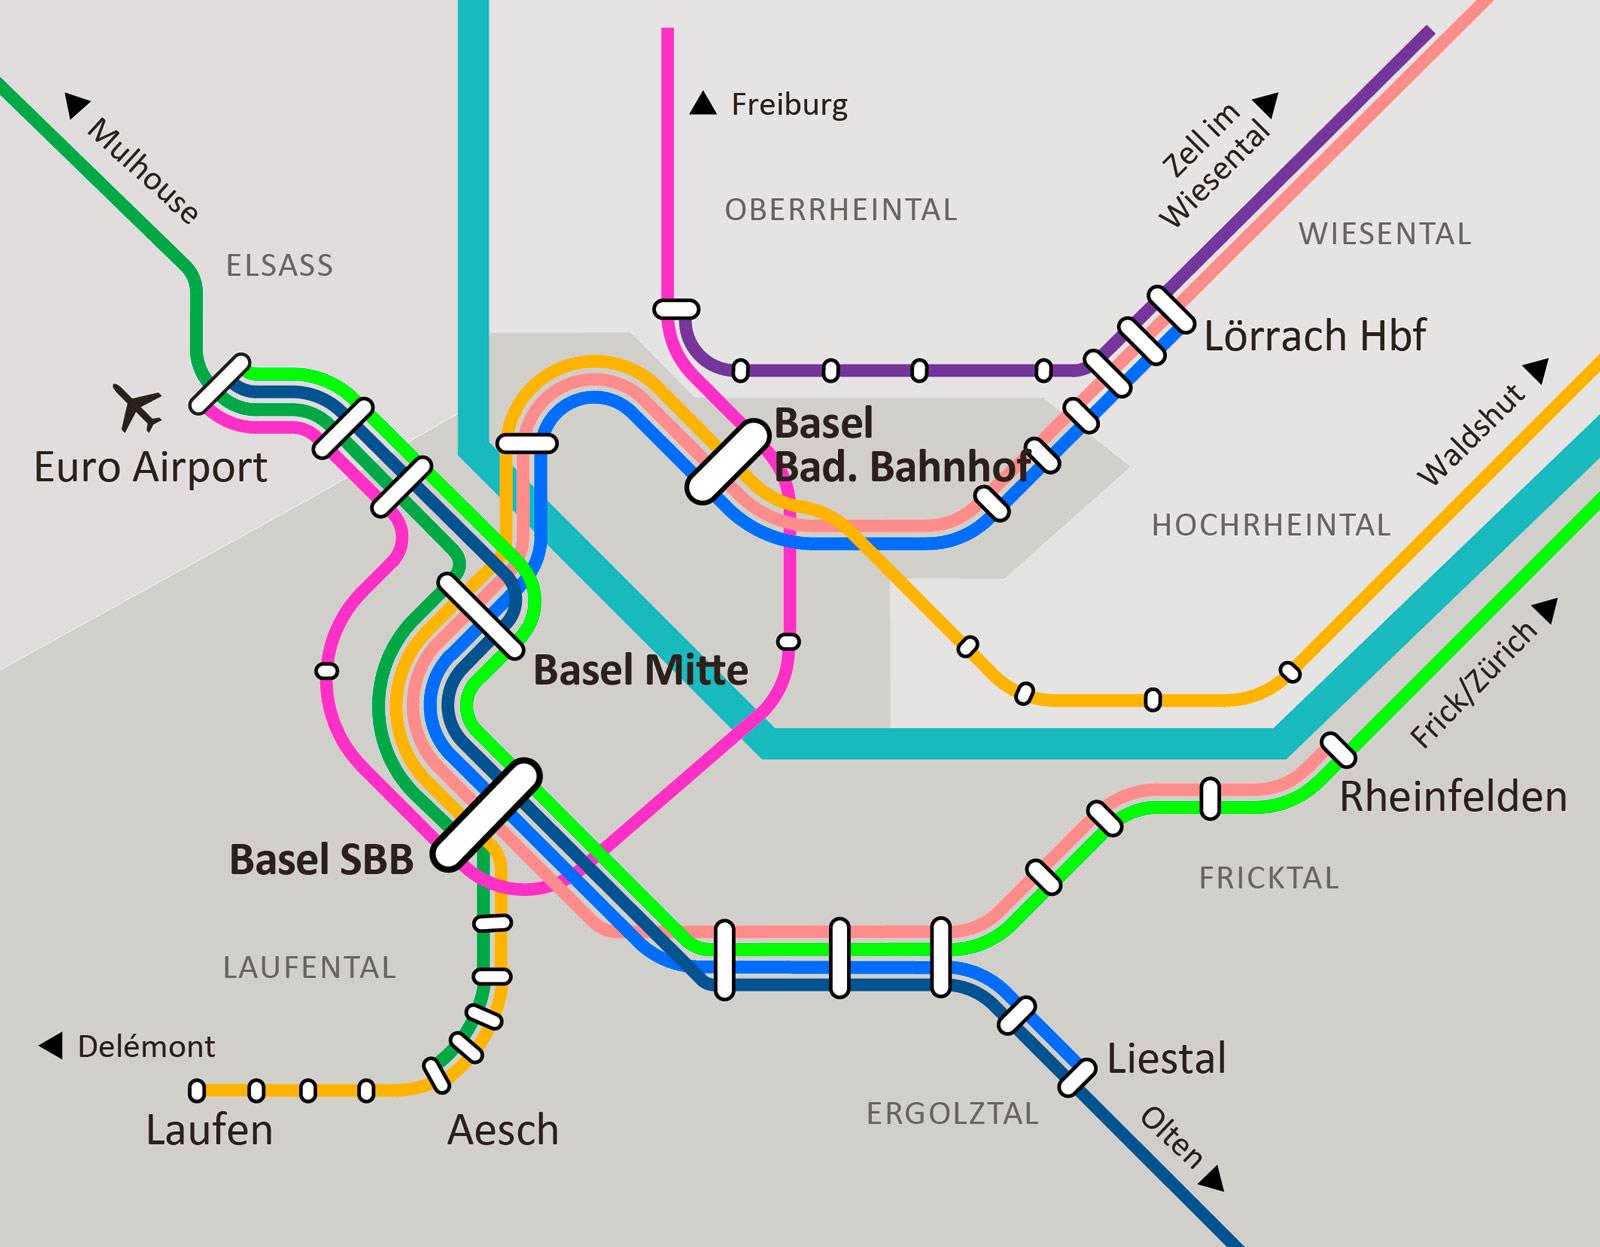 S-Bahn Angebotskonzept zukunft